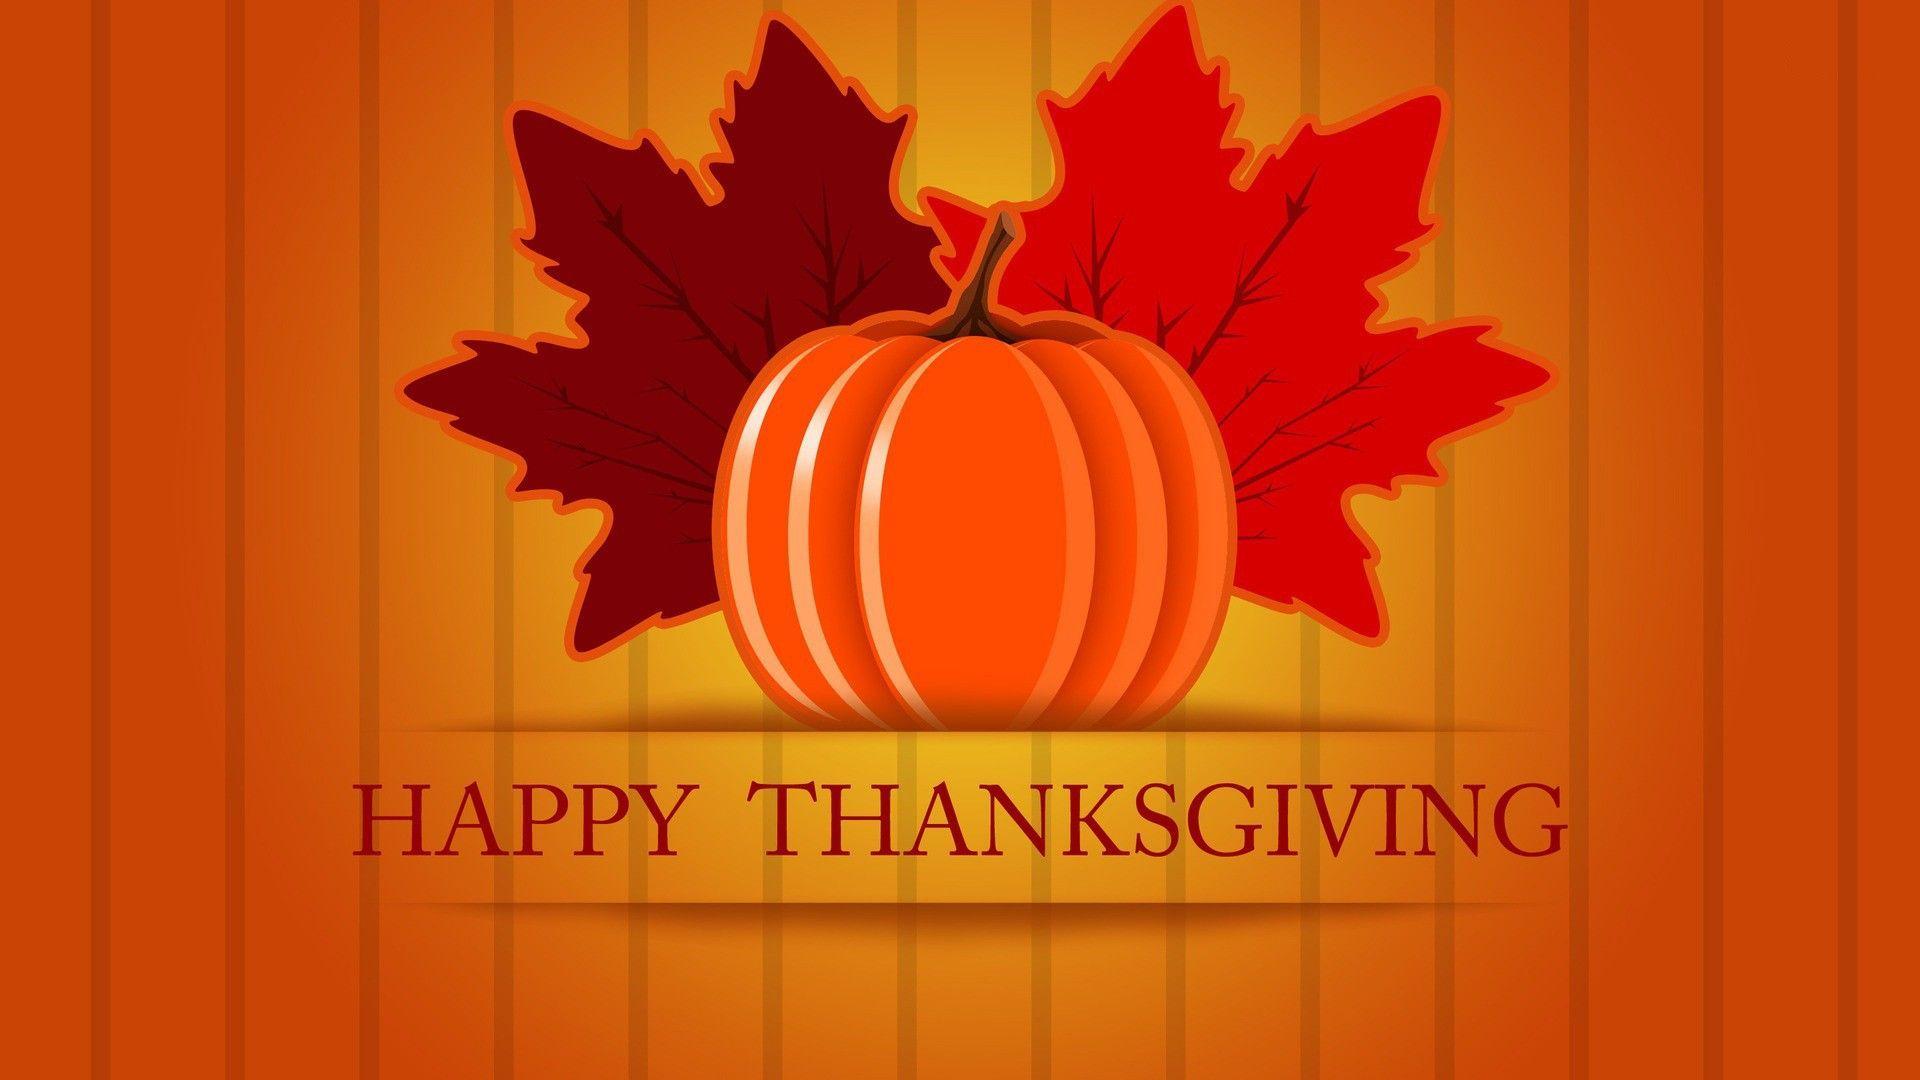 best Thanksgiving wallpaper – Download It For Your Desktop